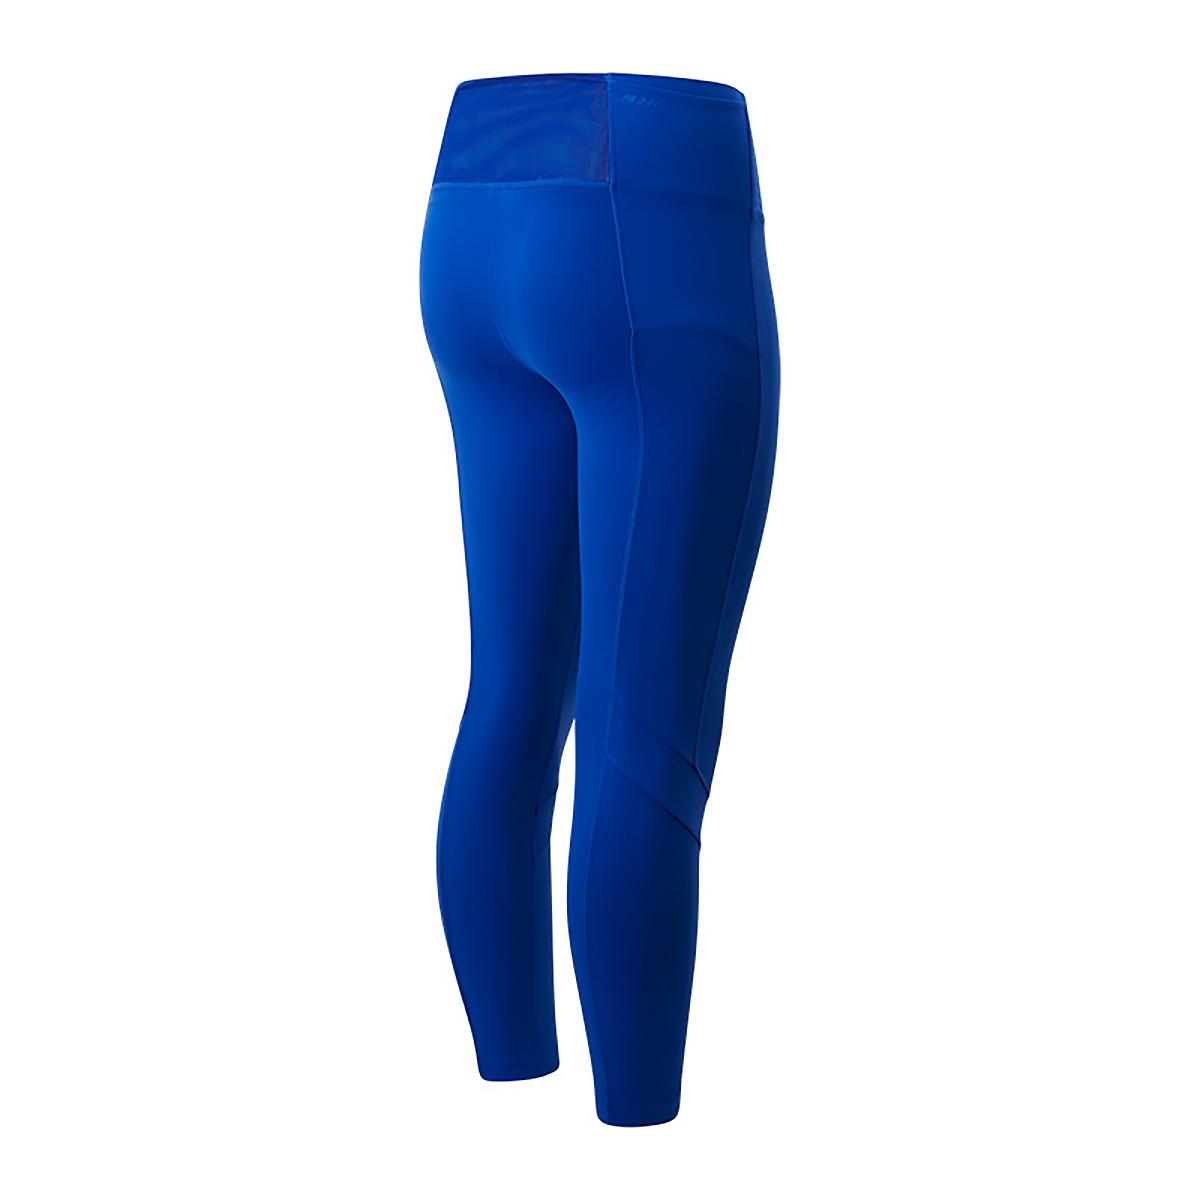 Women's New Balance Transform High Rise Pocket Crop - Color: Marine Blue - Size: XS, Marine Blue, large, image 2